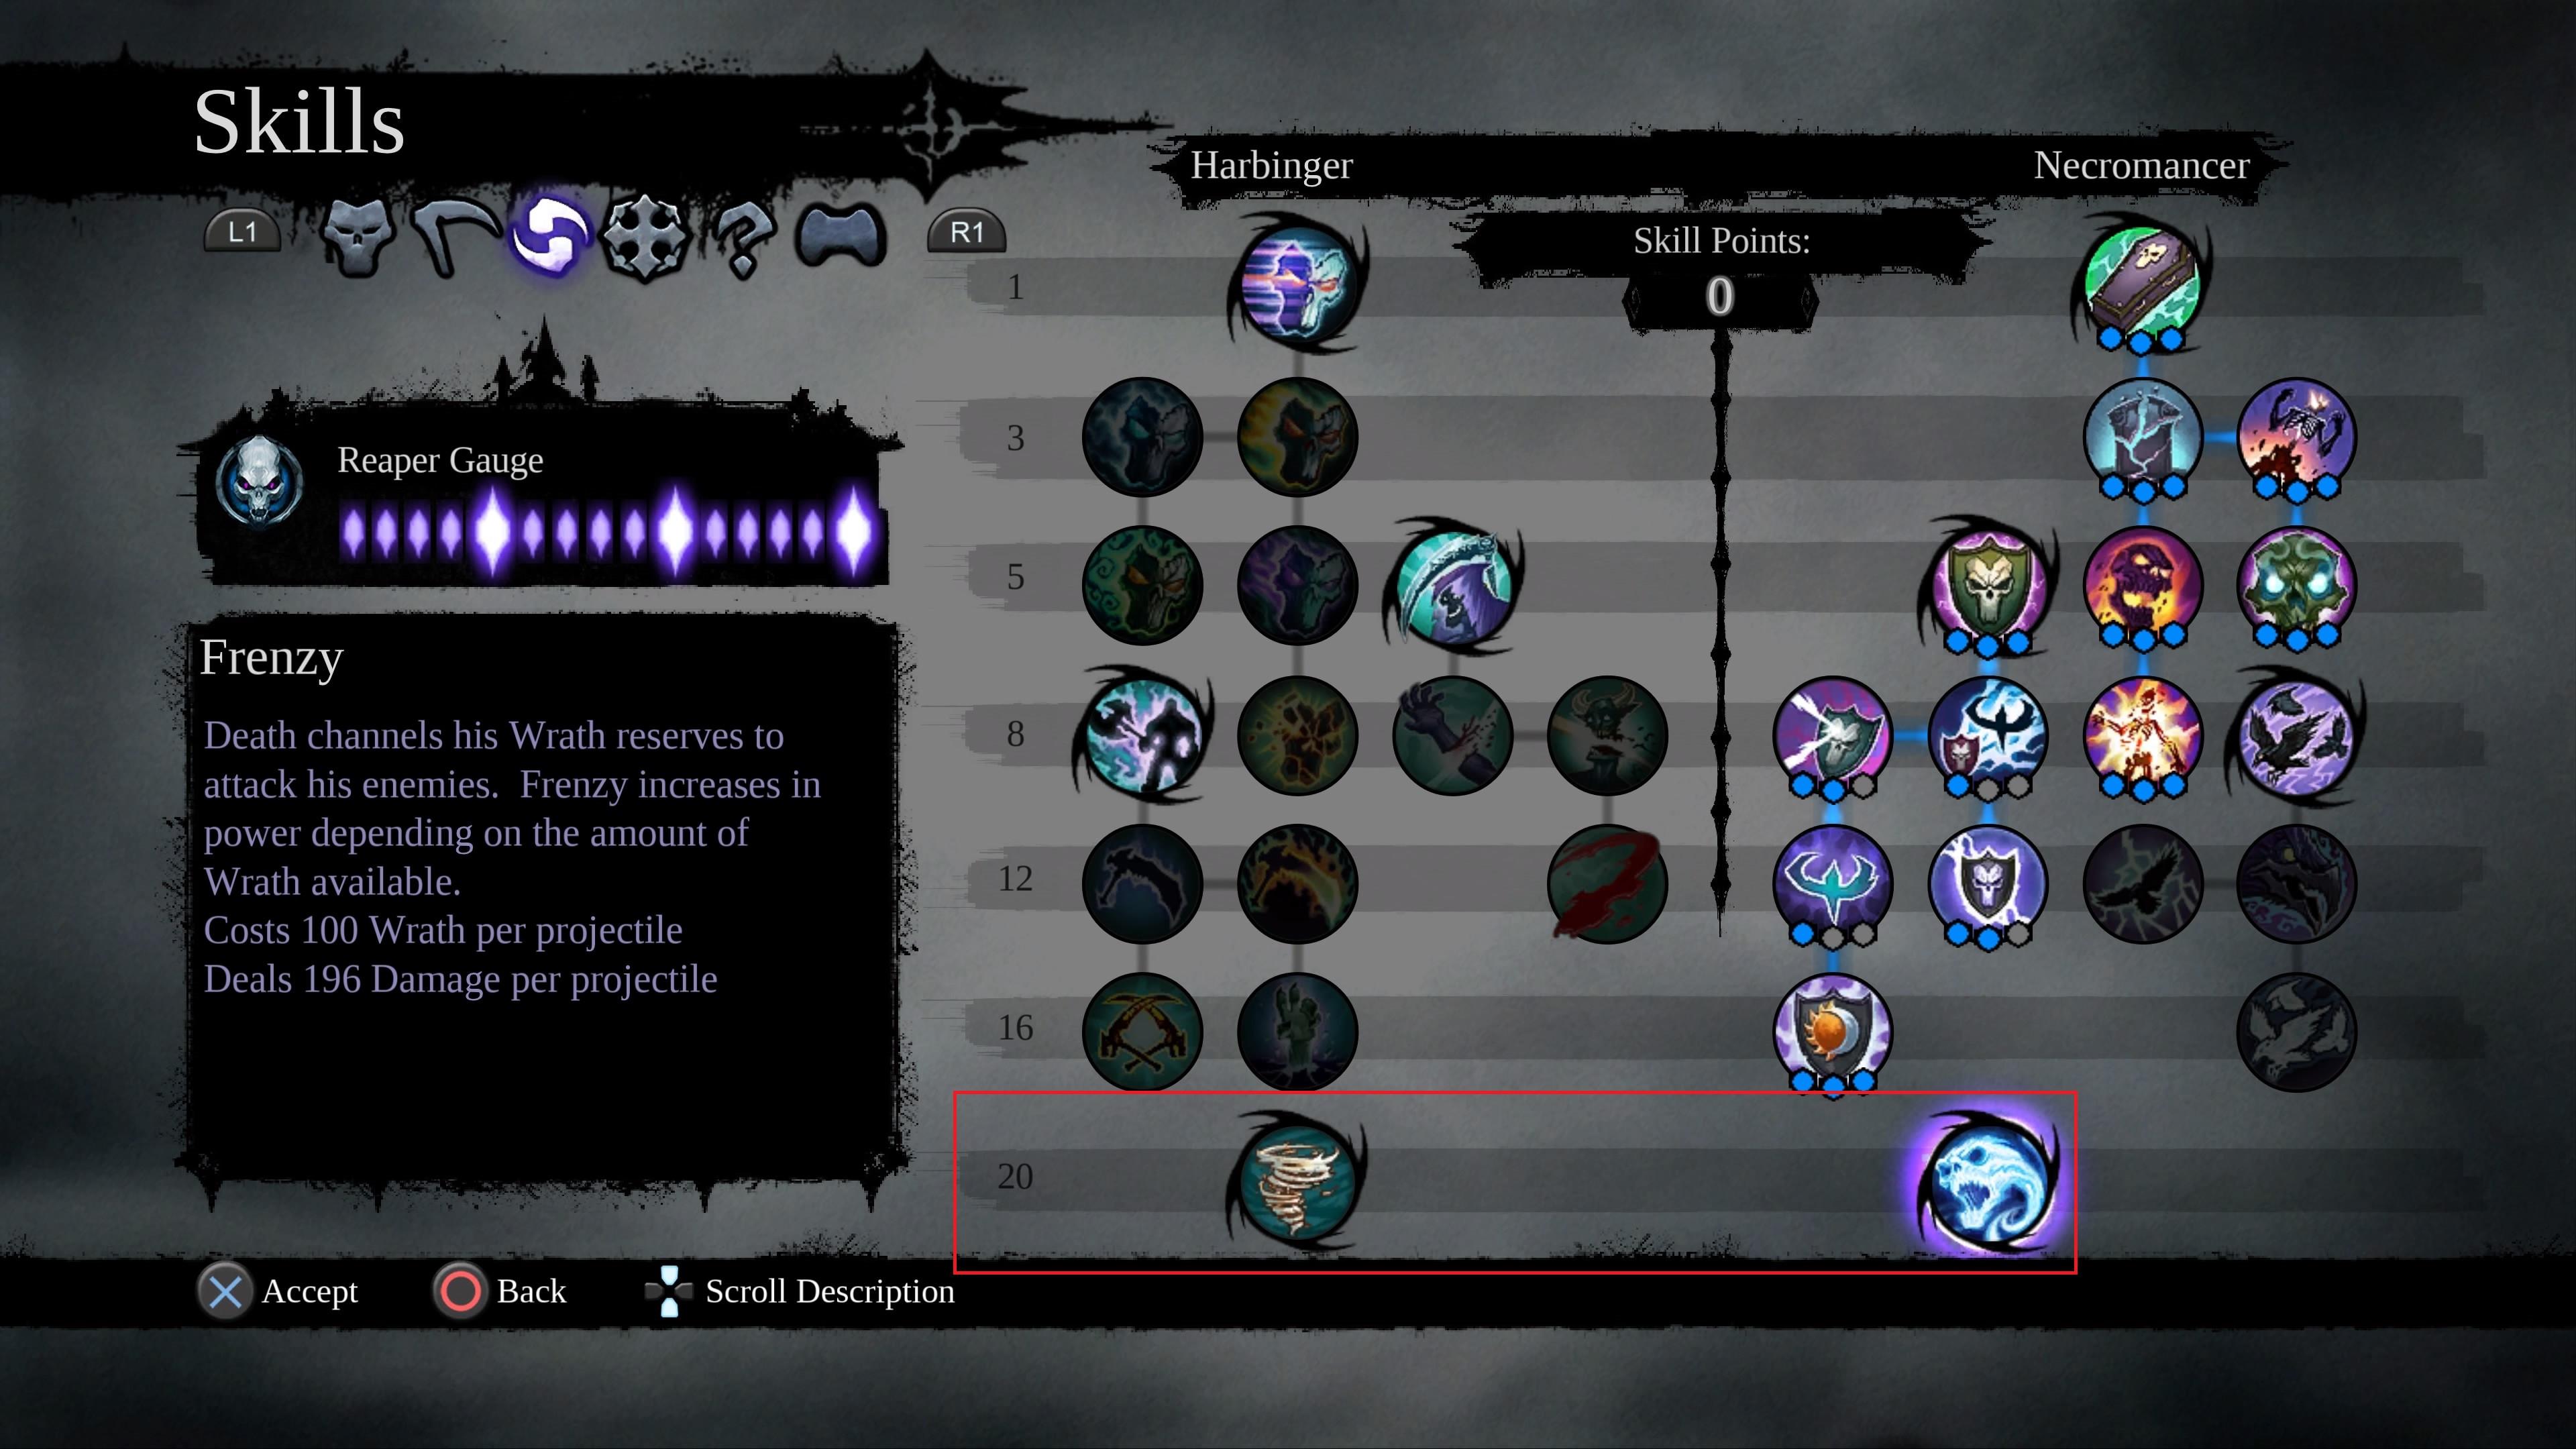 Darksiders Ii Trophy Guide Psnprofiles Com